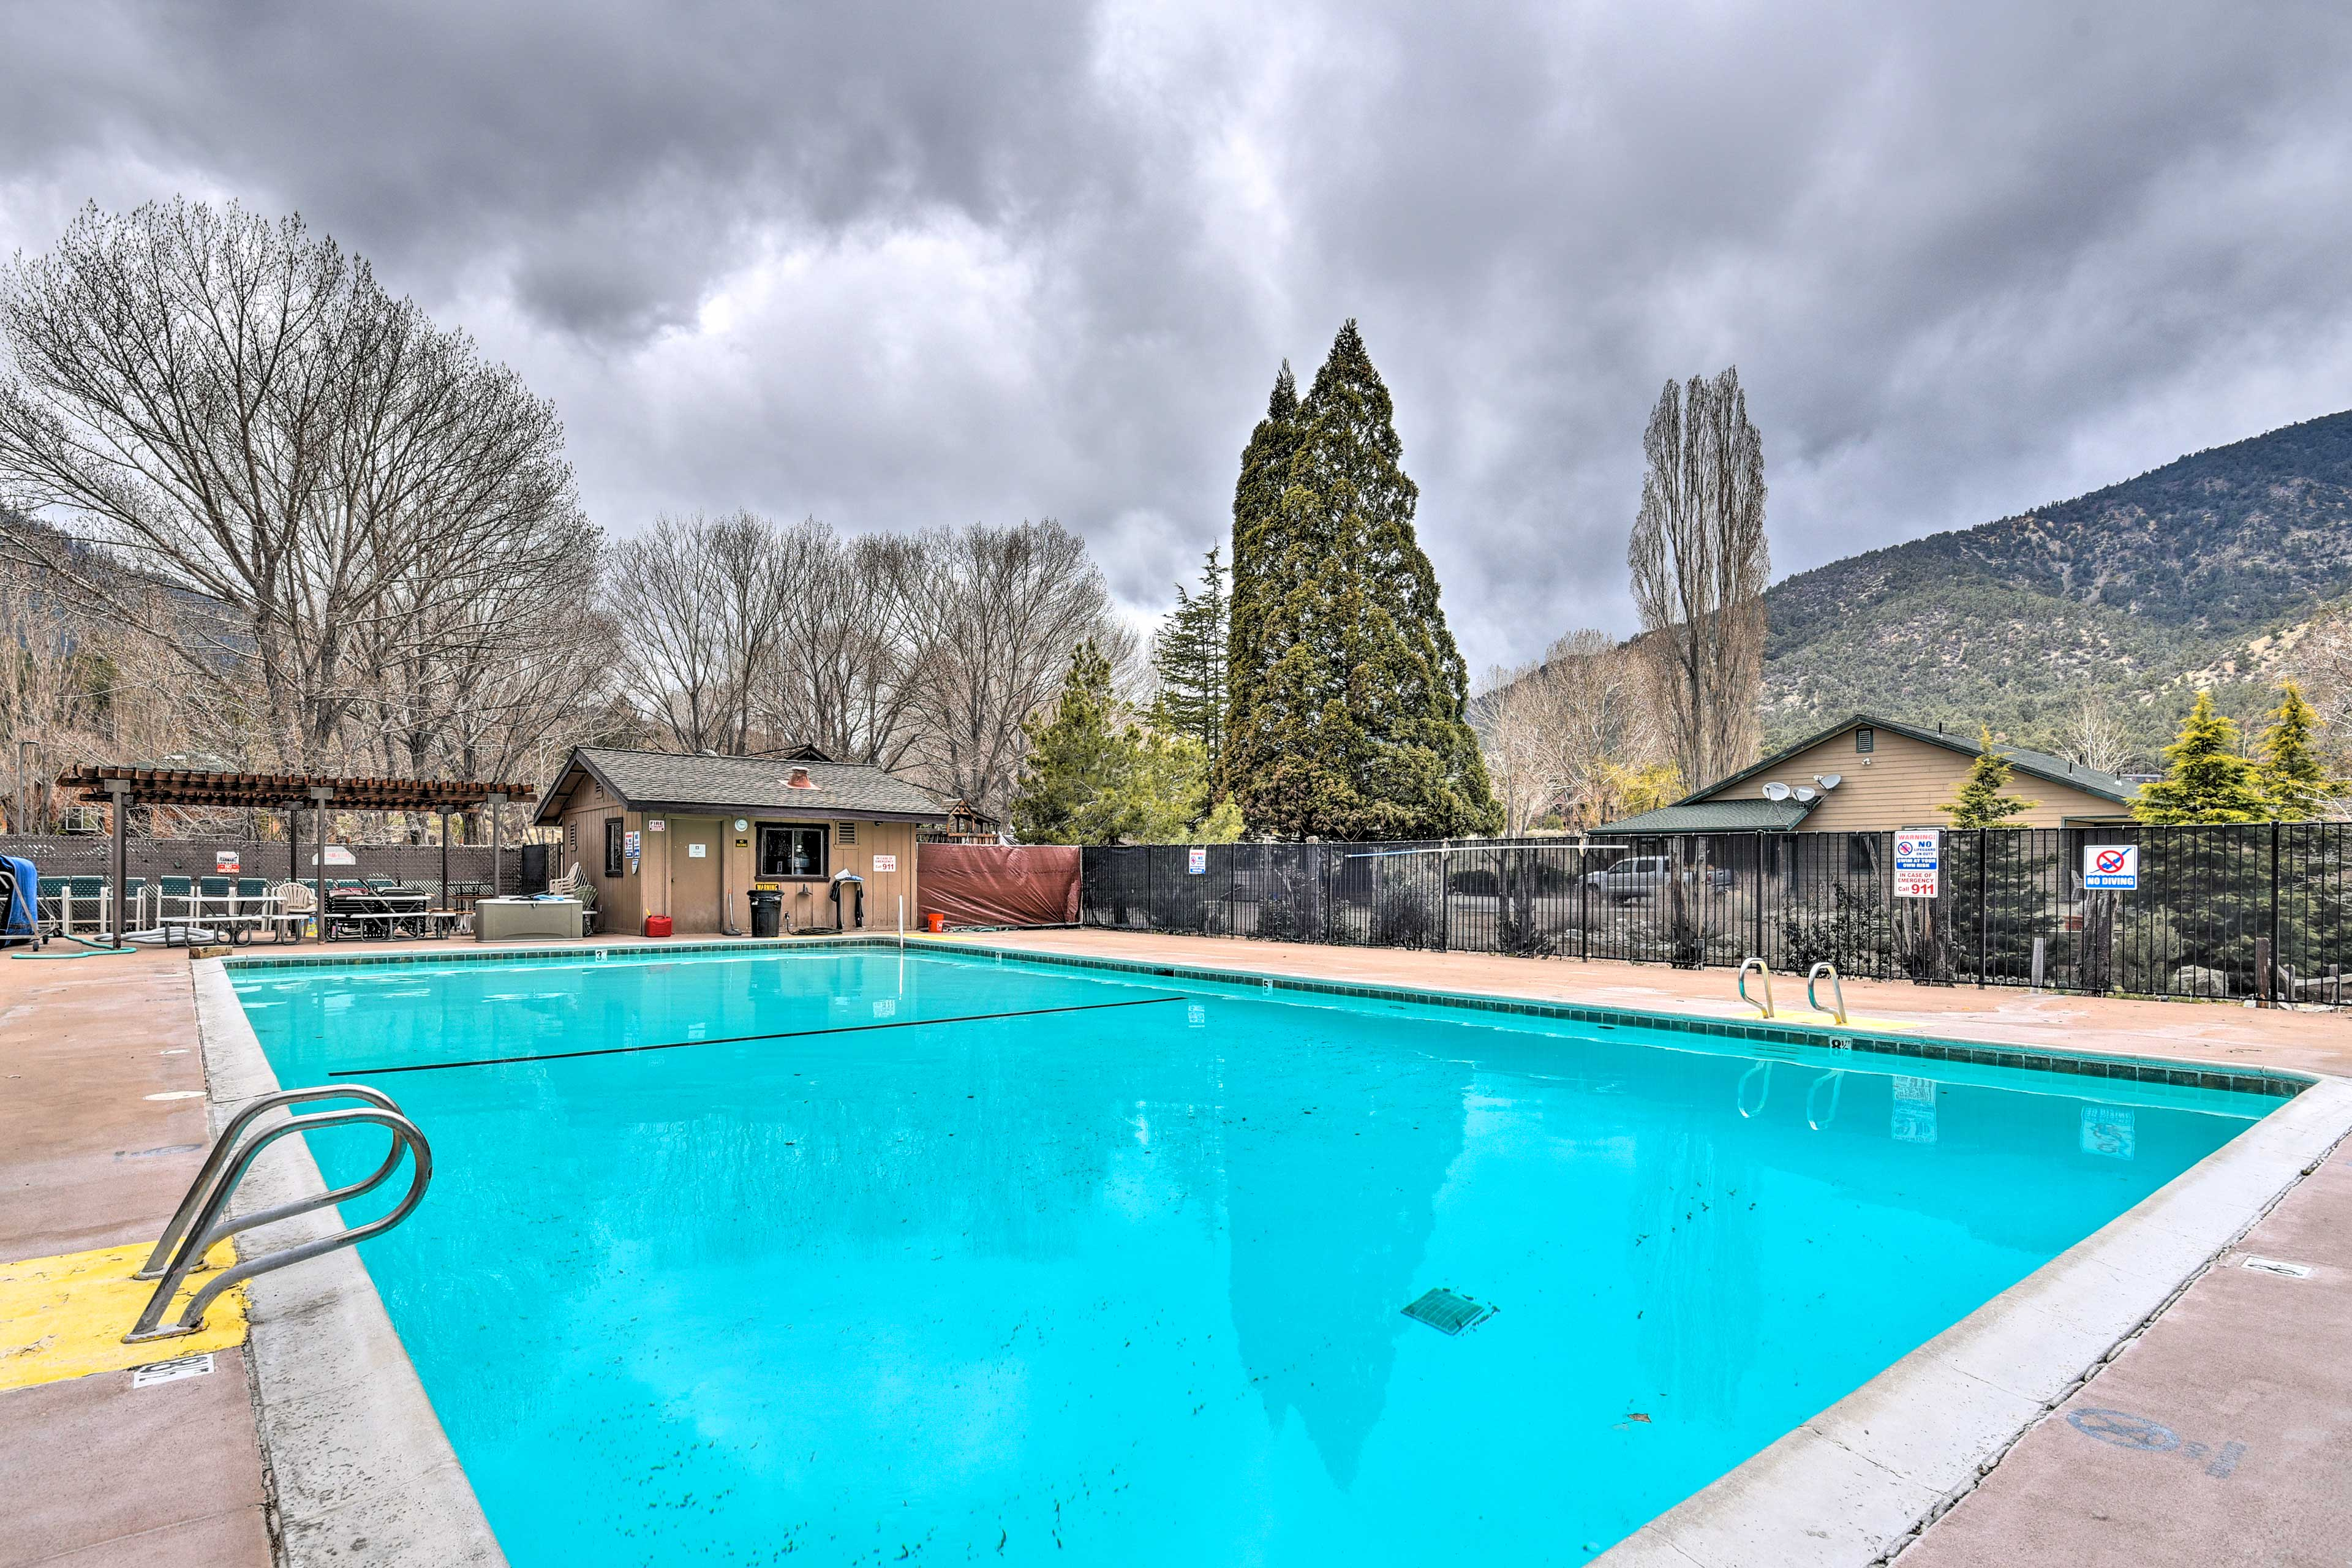 Make a splash at the community pool.